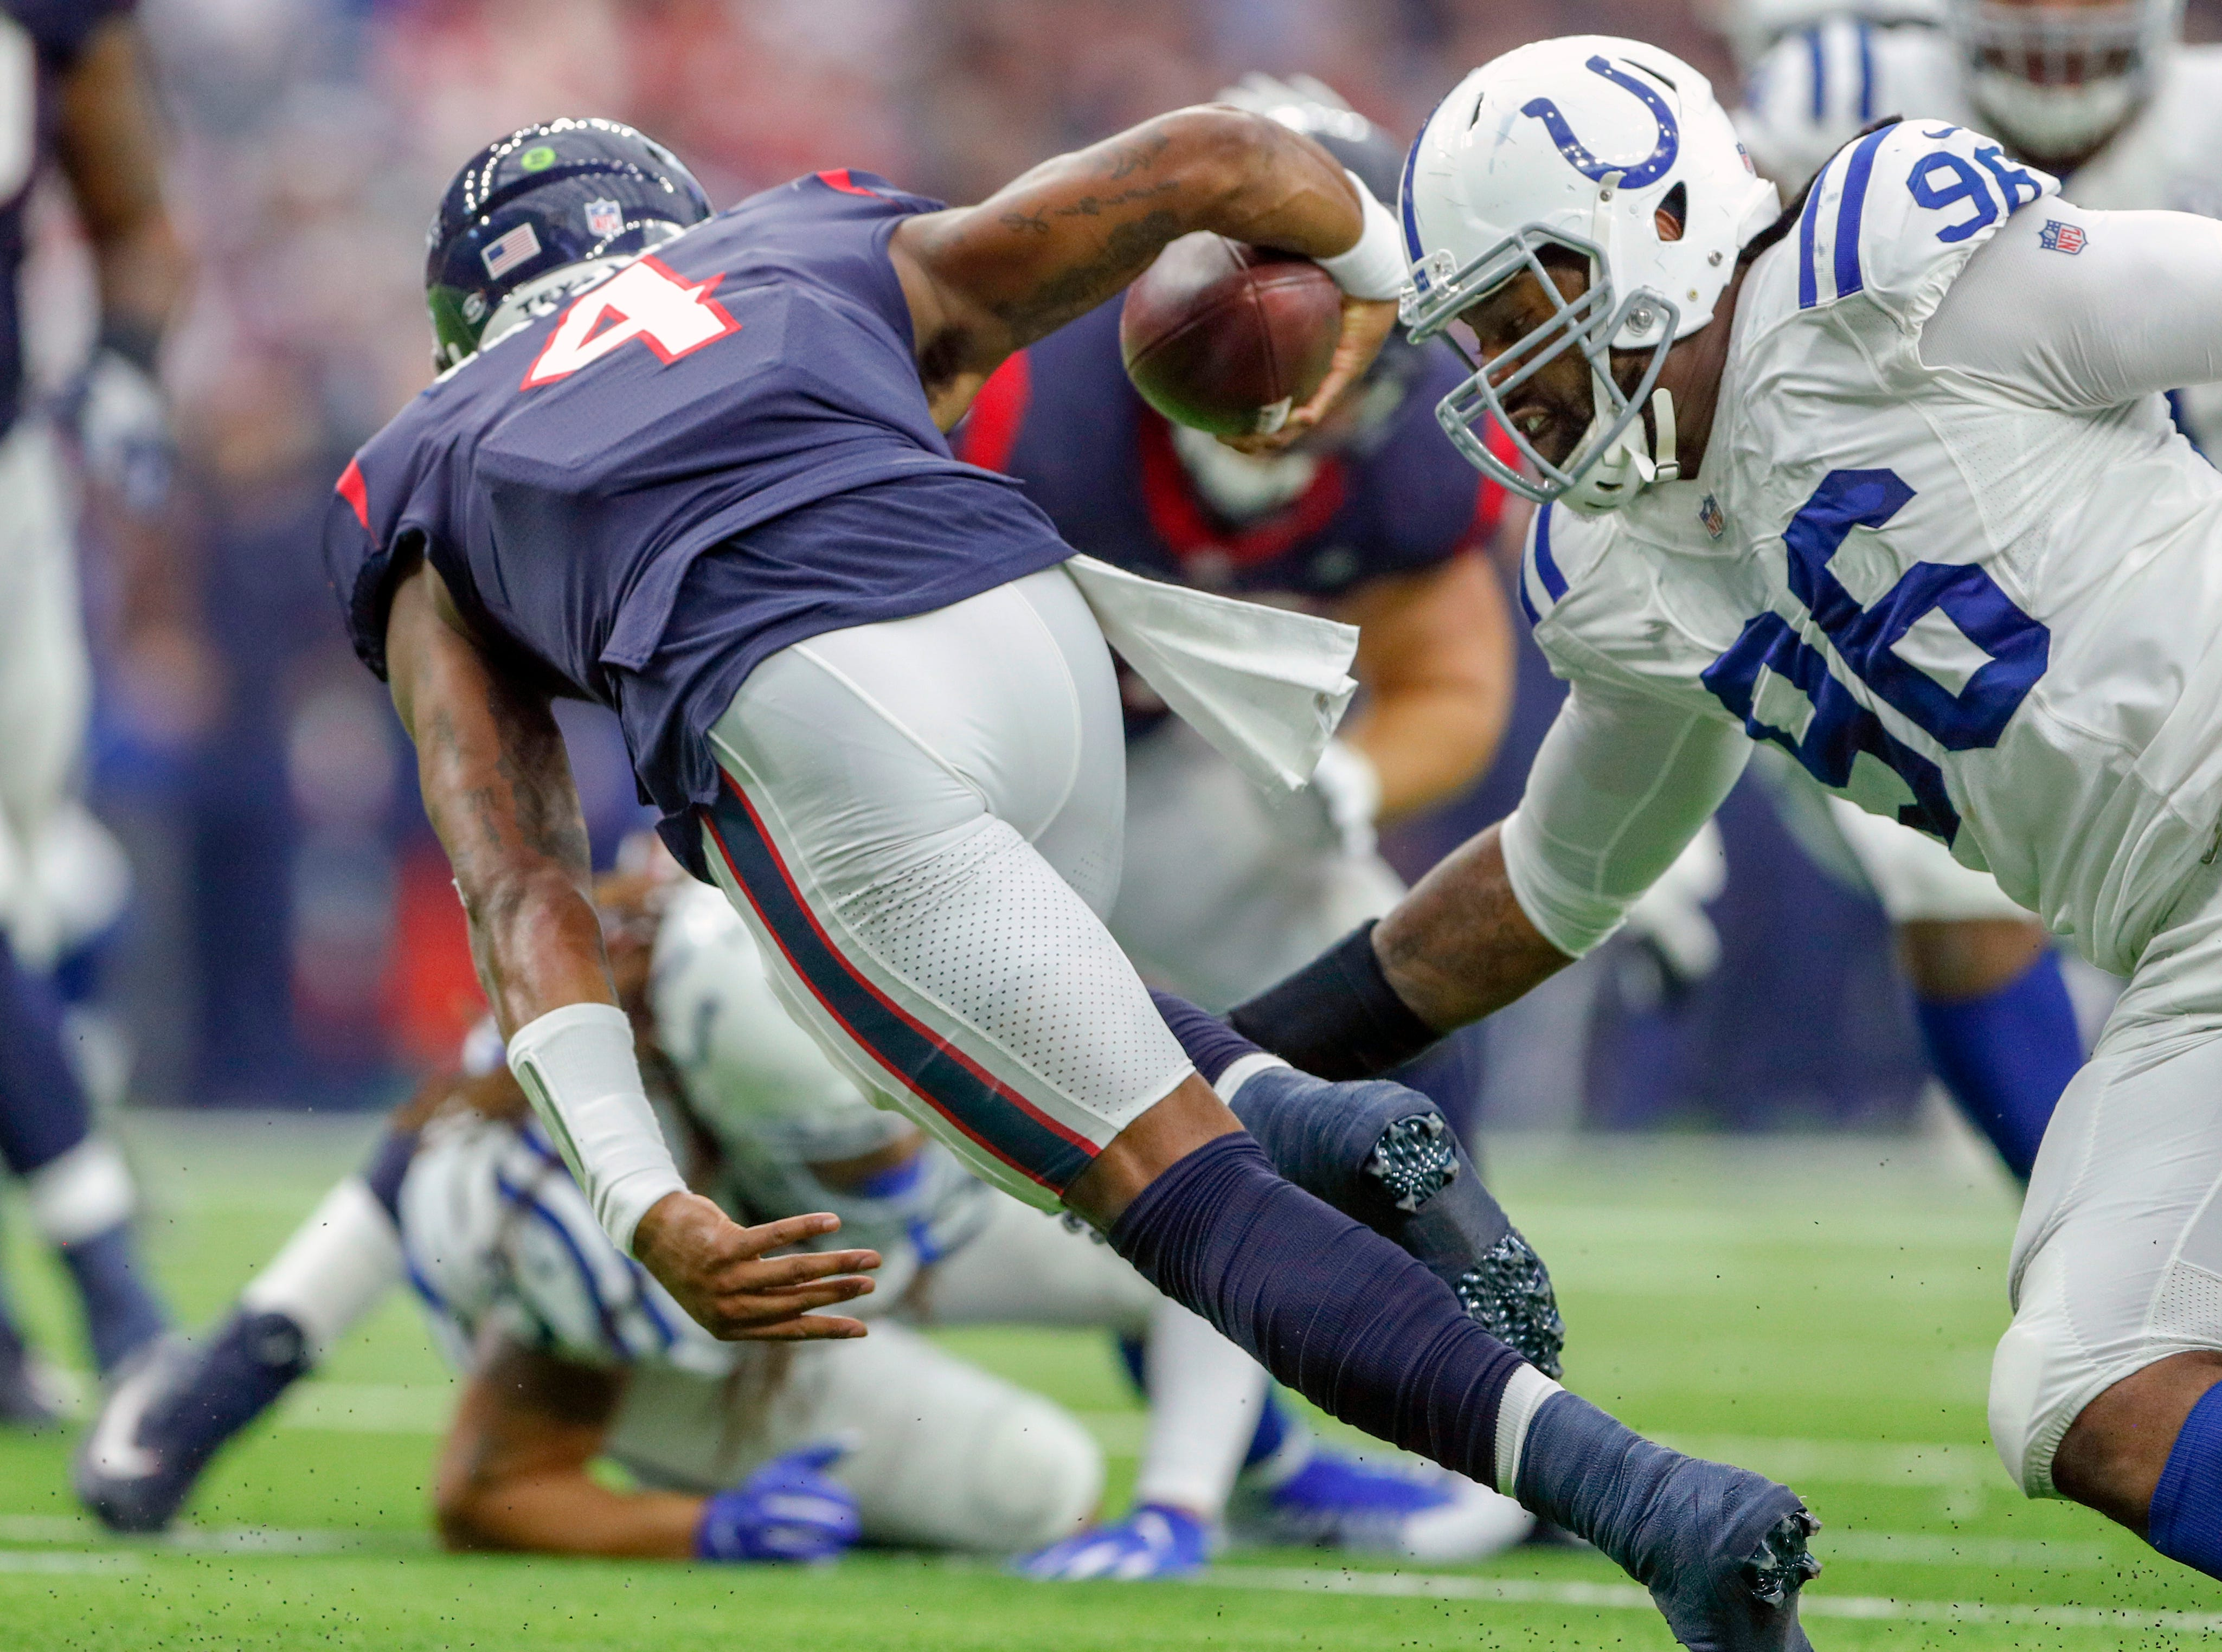 Indianapolis Colts defensive tackle Denico Autry (96) sakcs Houston Texans quarterback Deshaun Watson (4) at NRG Stadium in Houston on Sunday, Dec. 9, 2018.